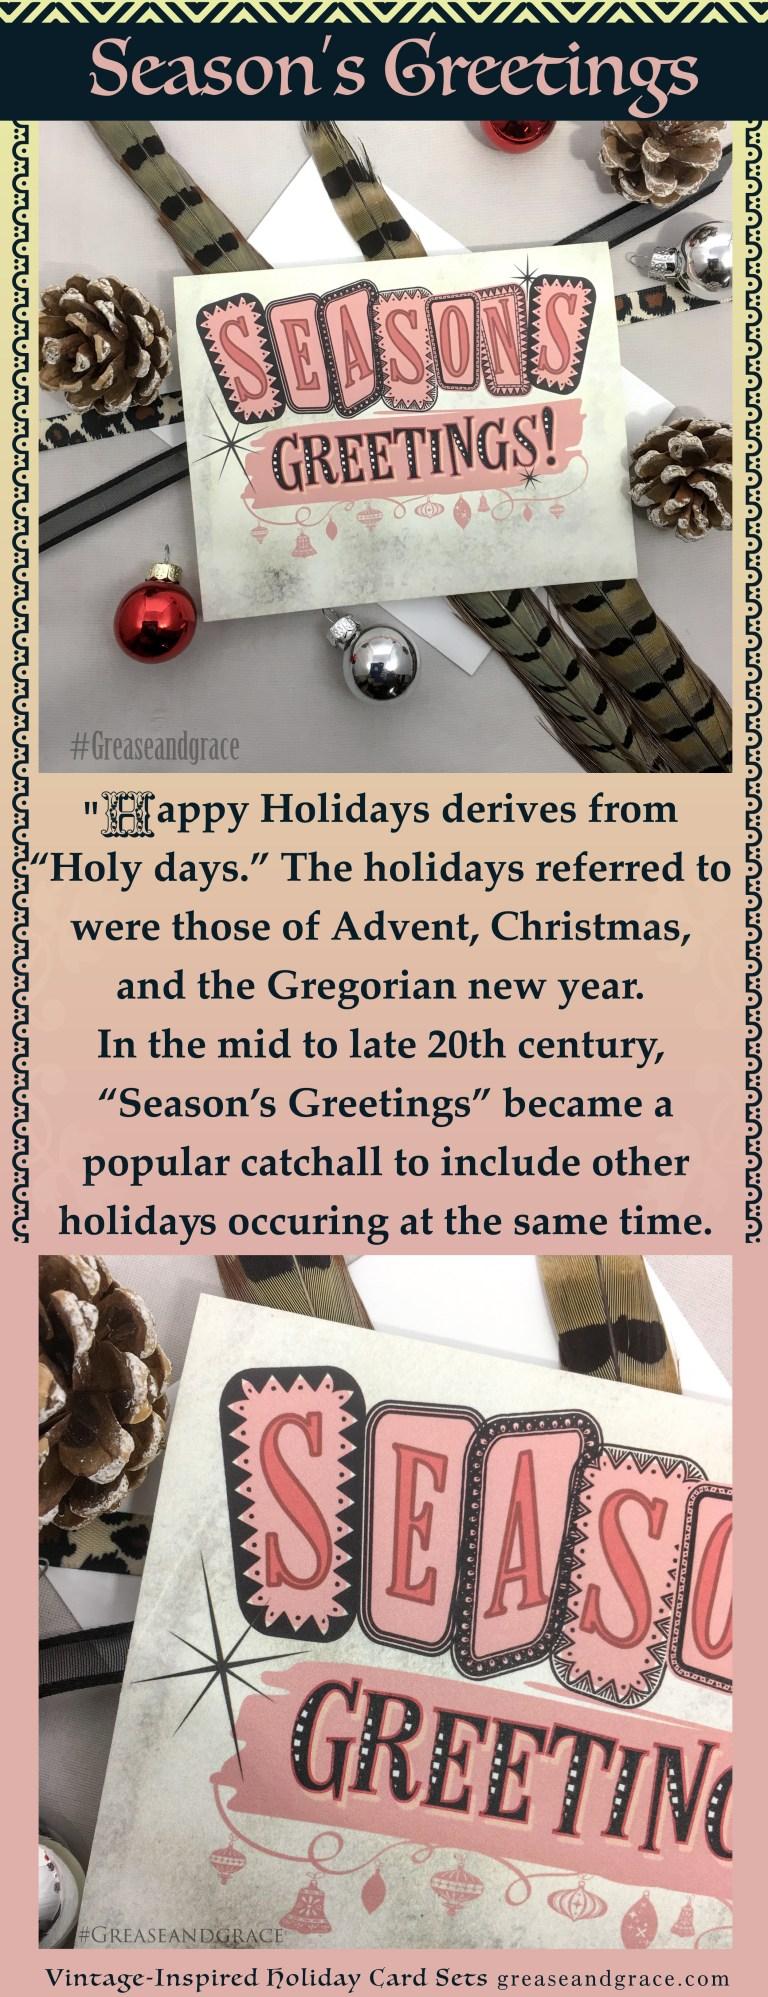 seasons greetings christmas non denominational holiday card